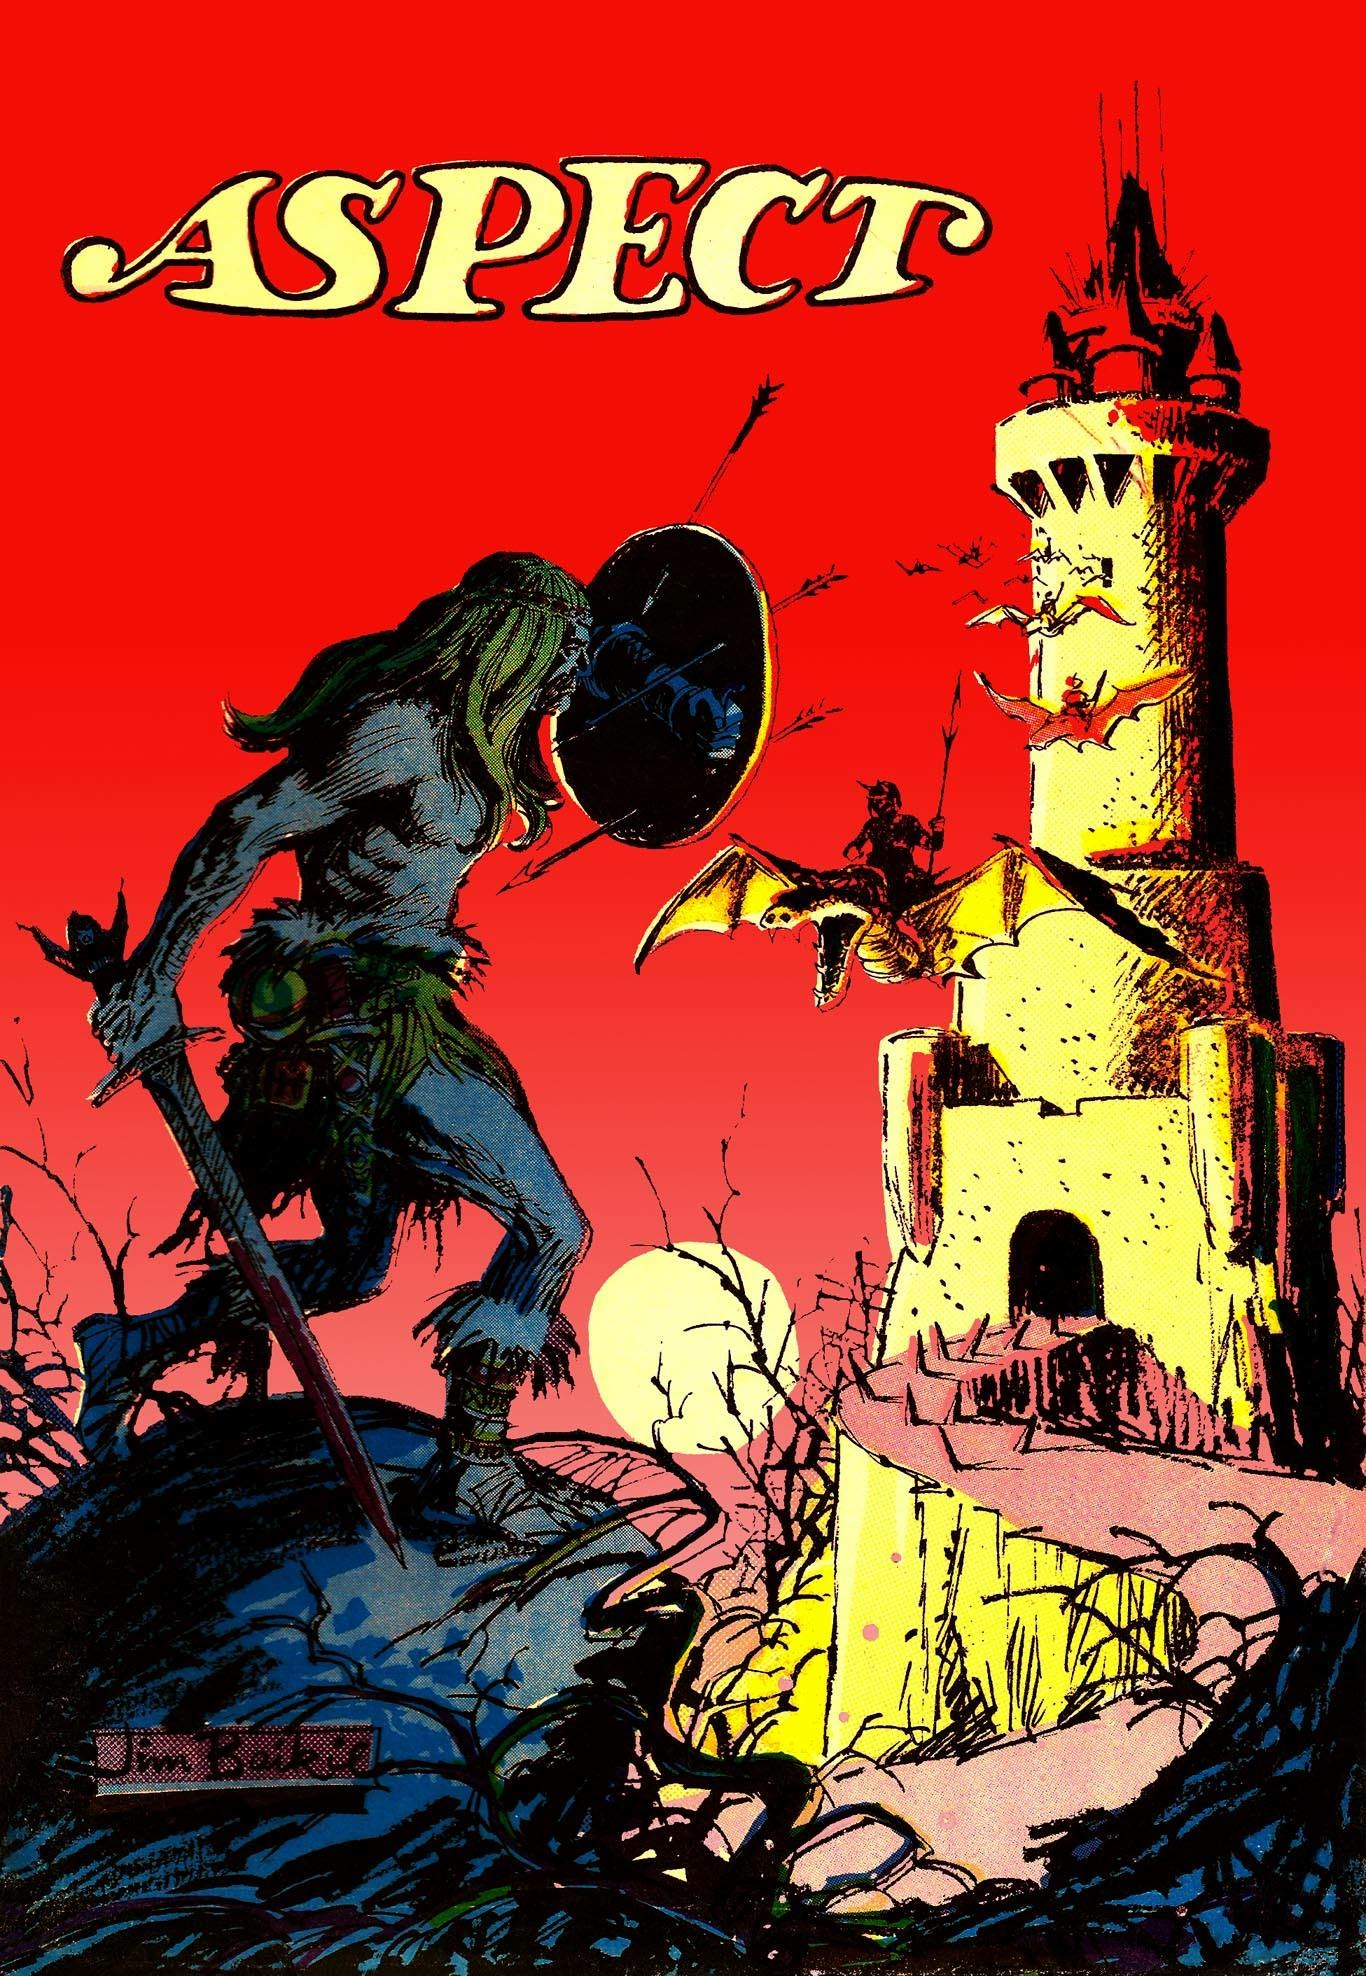 Aspect - cover by Jim Baikie